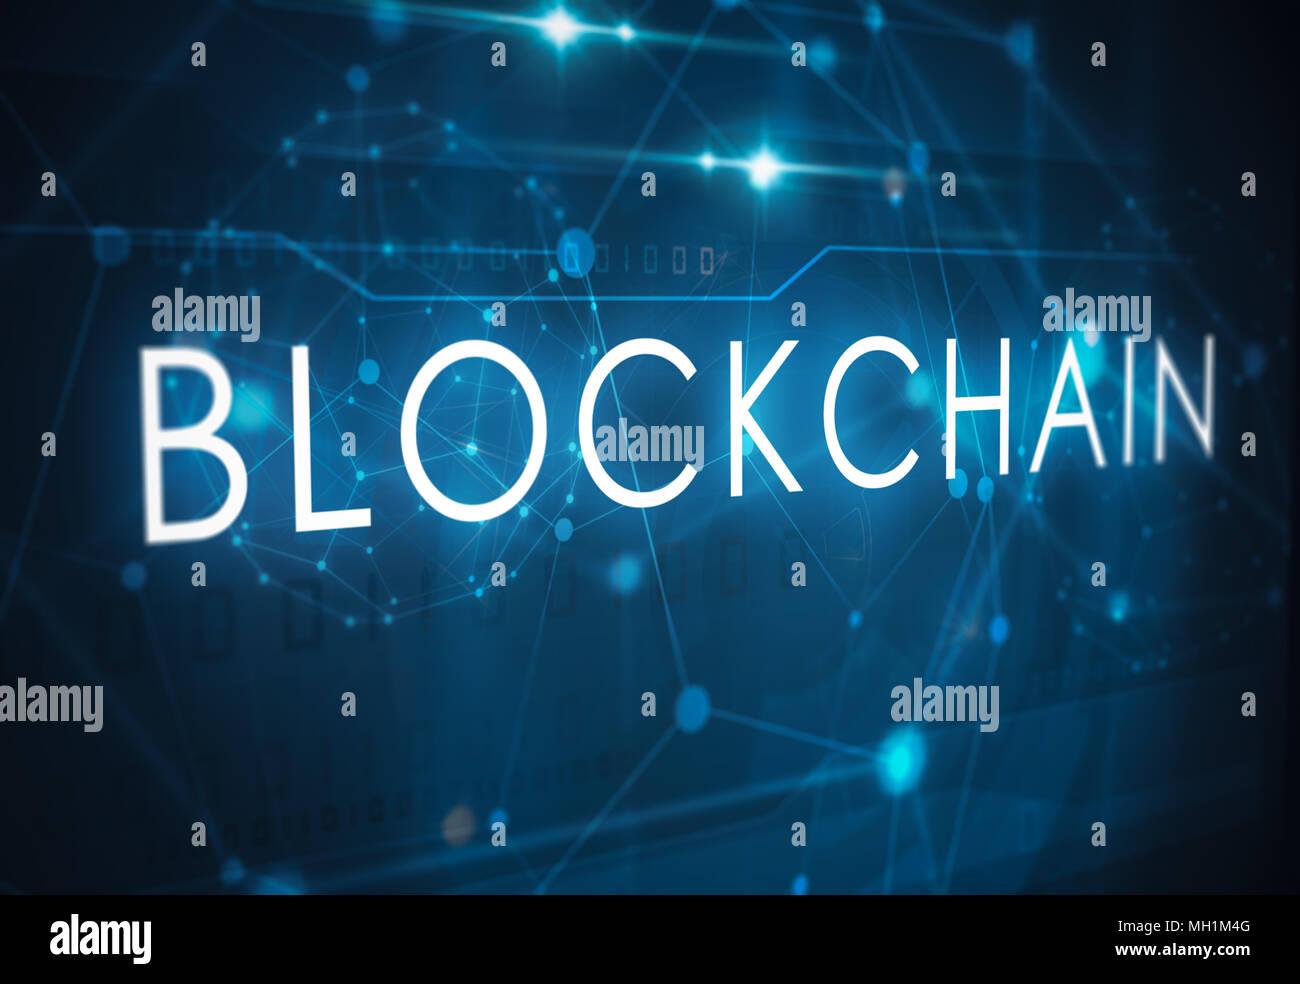 blockchain technology concept - Stock Image